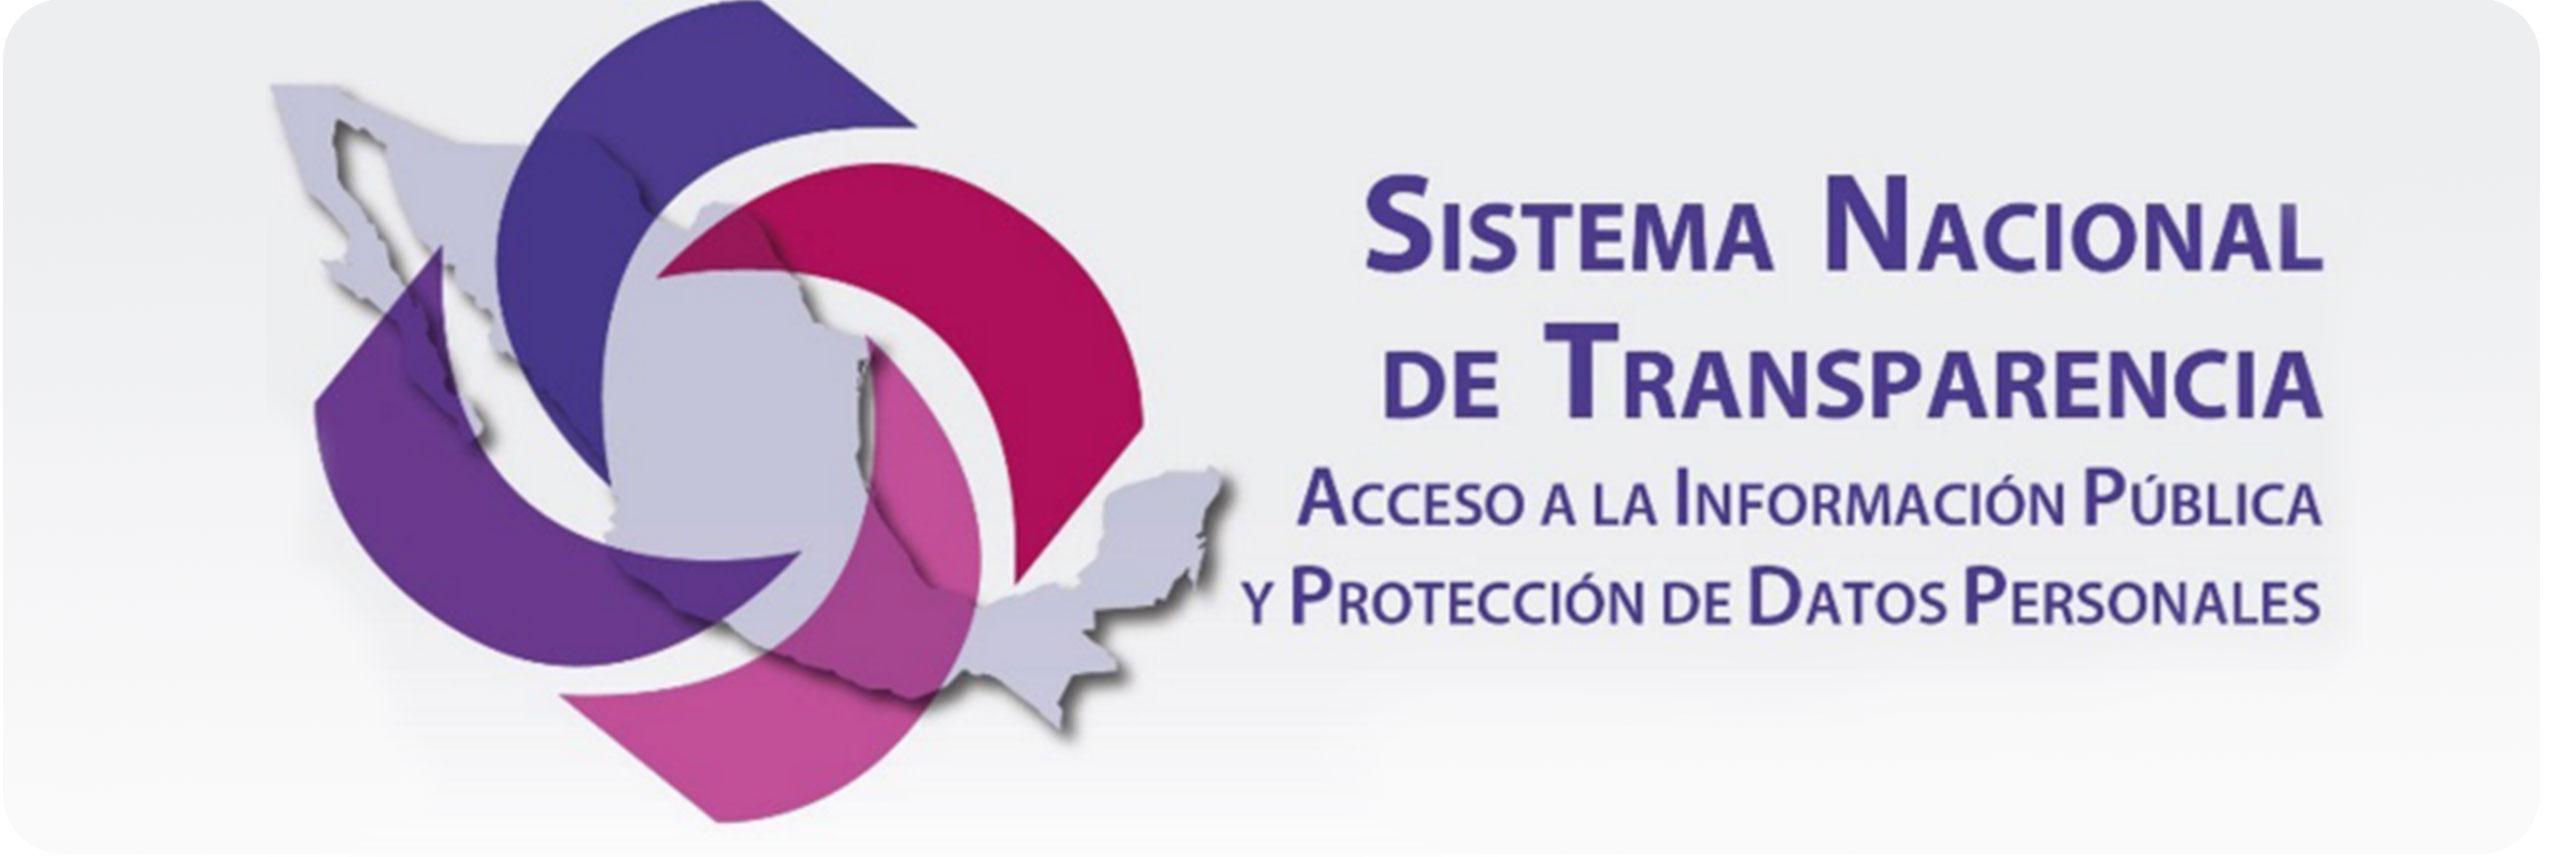 sistema-nacional-transparencia